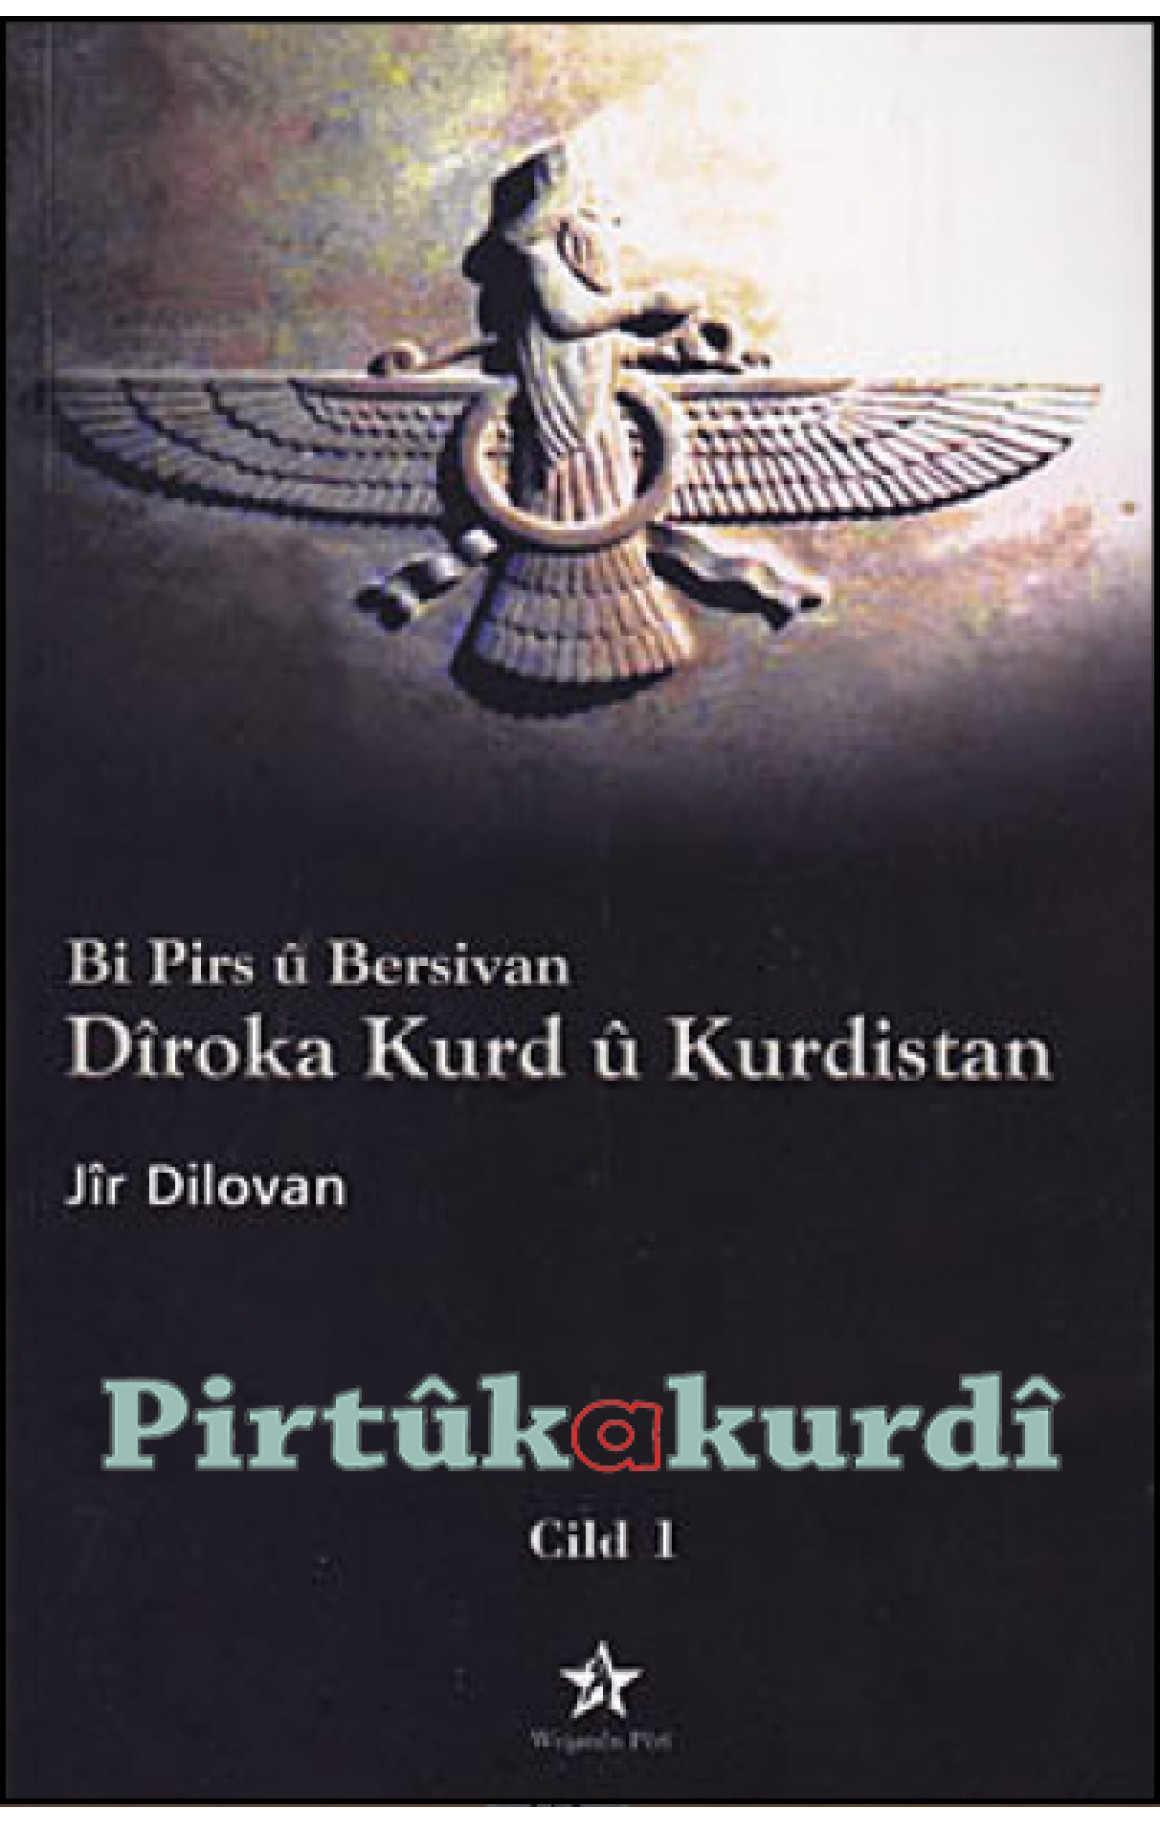 Bi Pirs u Bersivan Diroka Kurd u Kurdistan